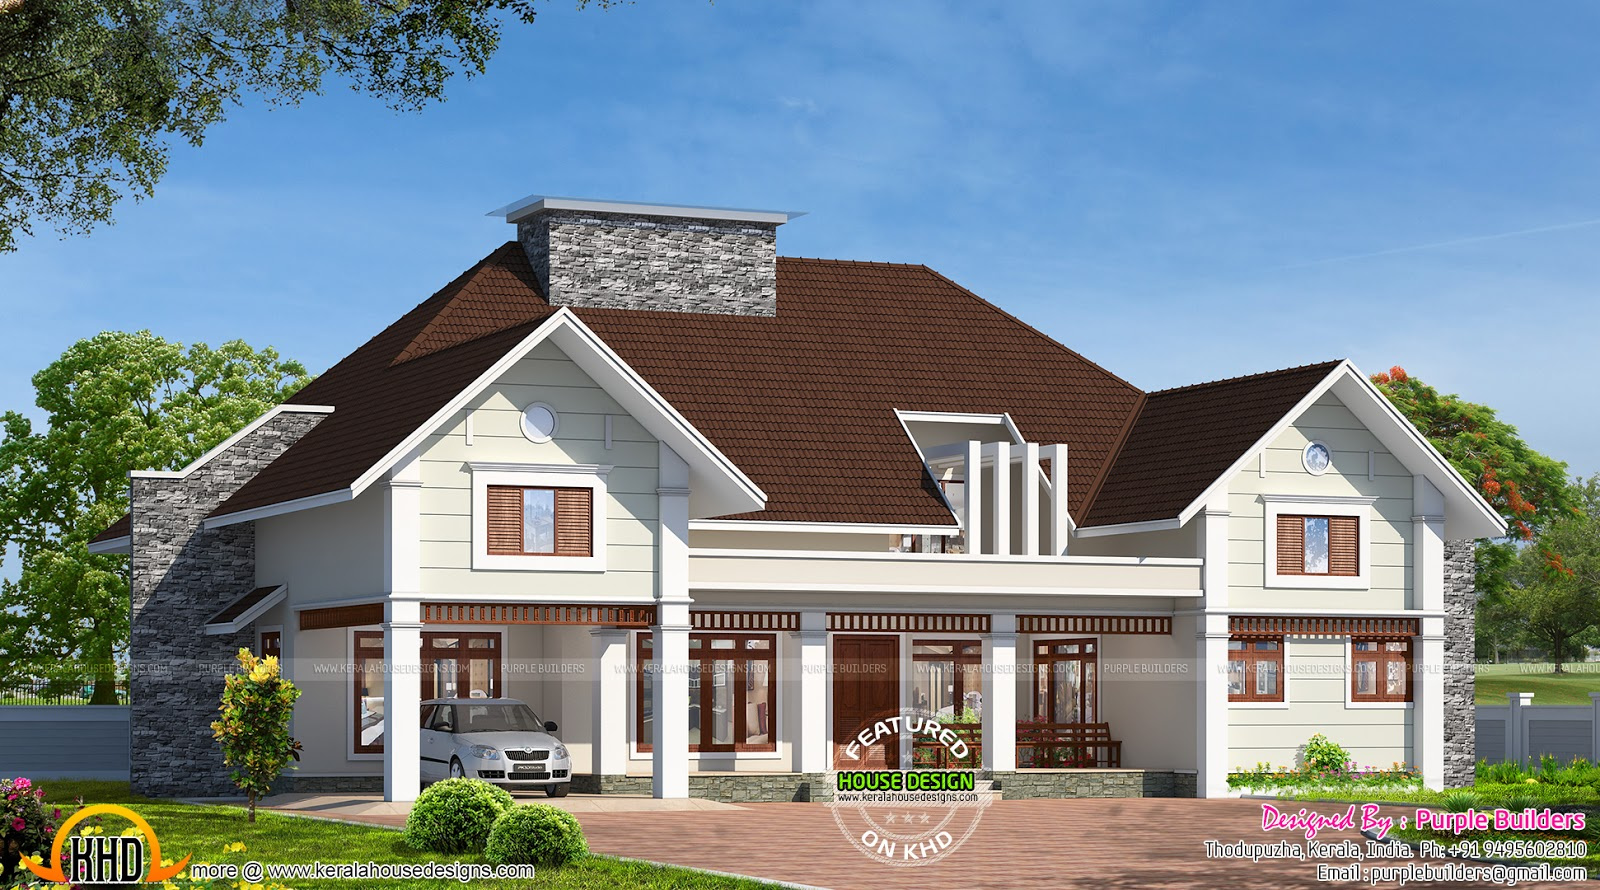 Small Kitchen Living Room Open Floor Plan Bungalow House In Kerala Kerala Home Design And Floor Plans